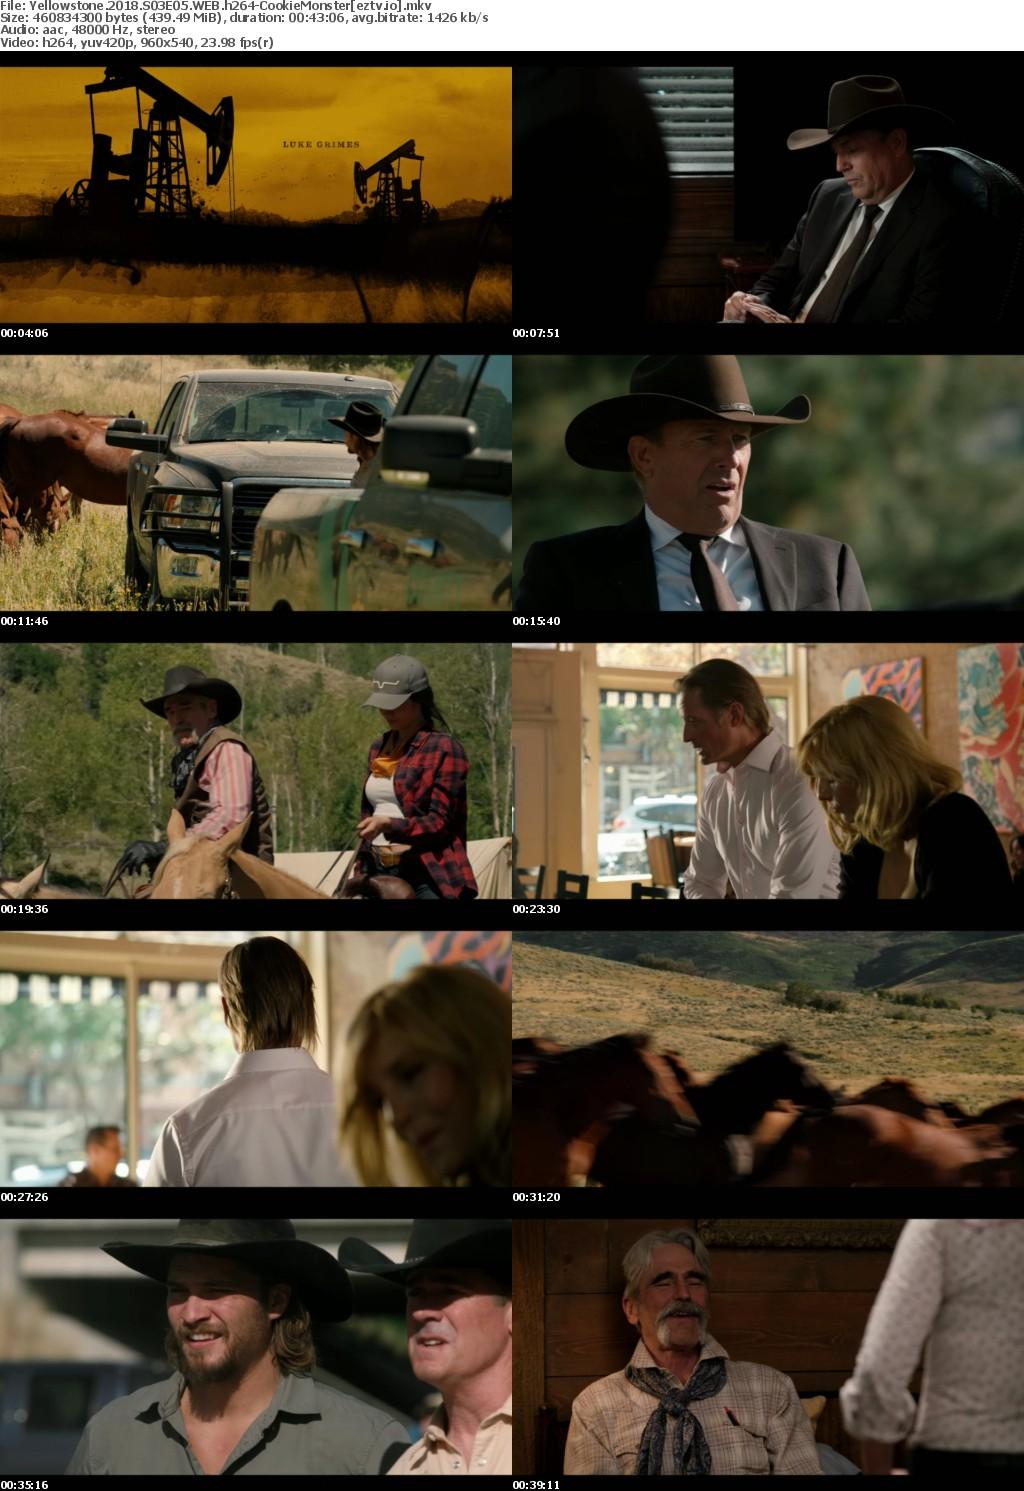 Yellowstone 2018 S03E05 WEB h264-CookieMonster